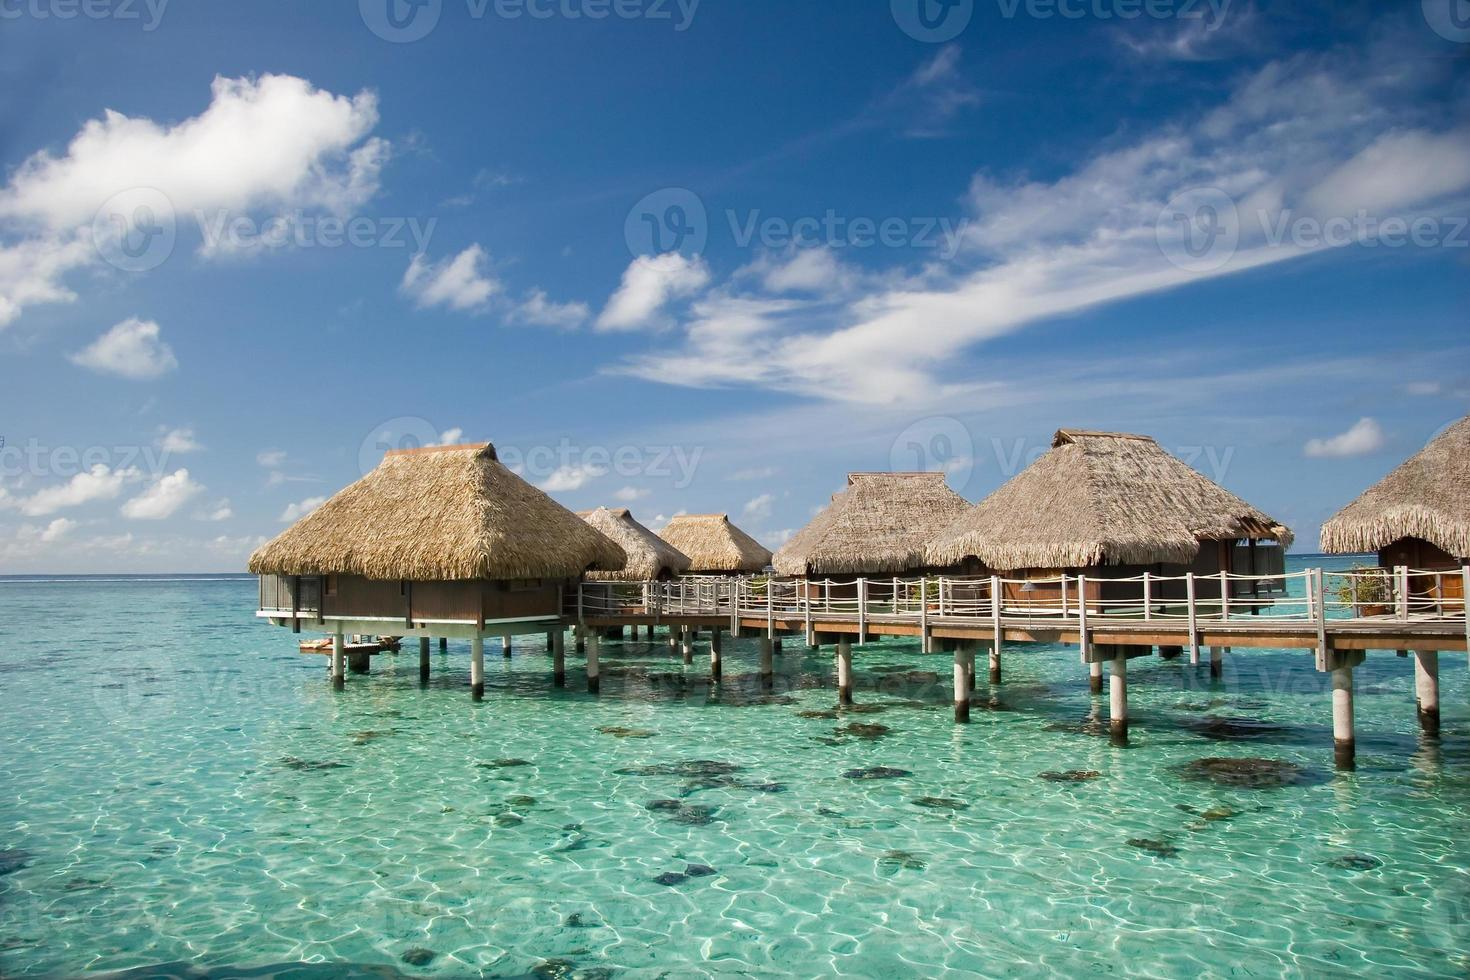 bungalow sull'acqua moorea foto